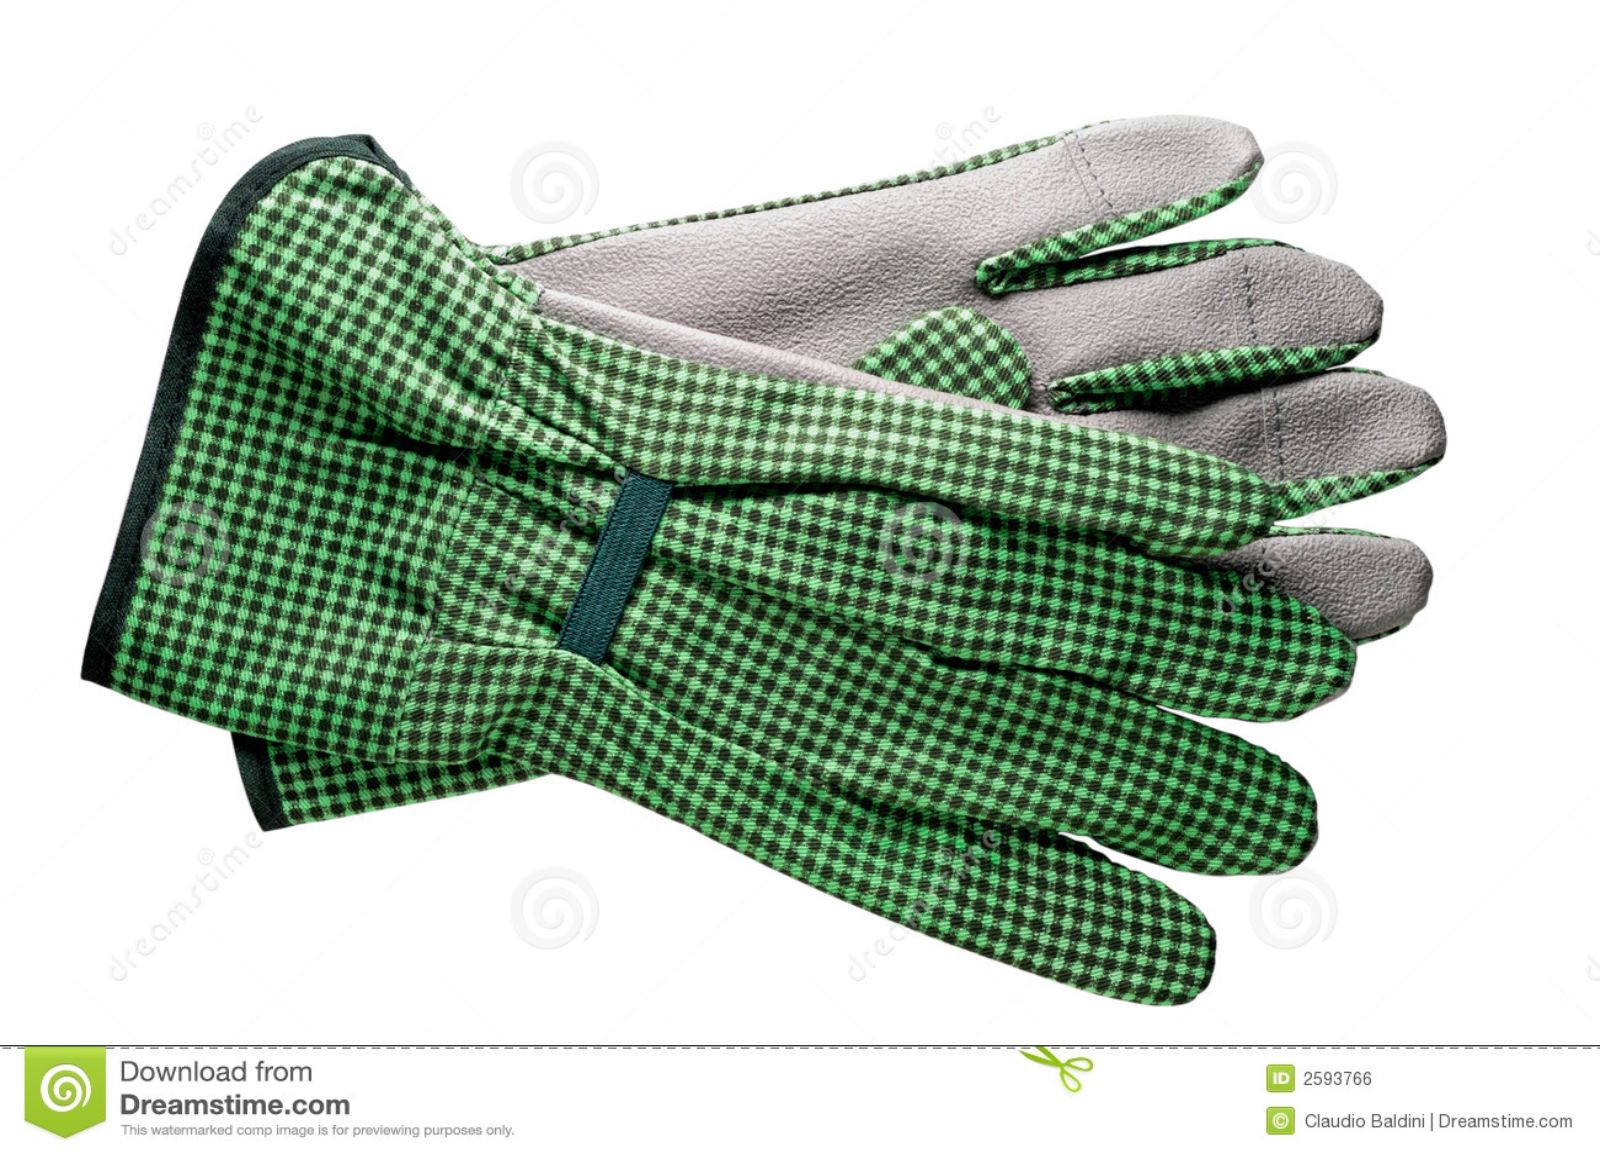 Gardening Tools: Gloves Royalty Free Stock Image - Image: 2593766